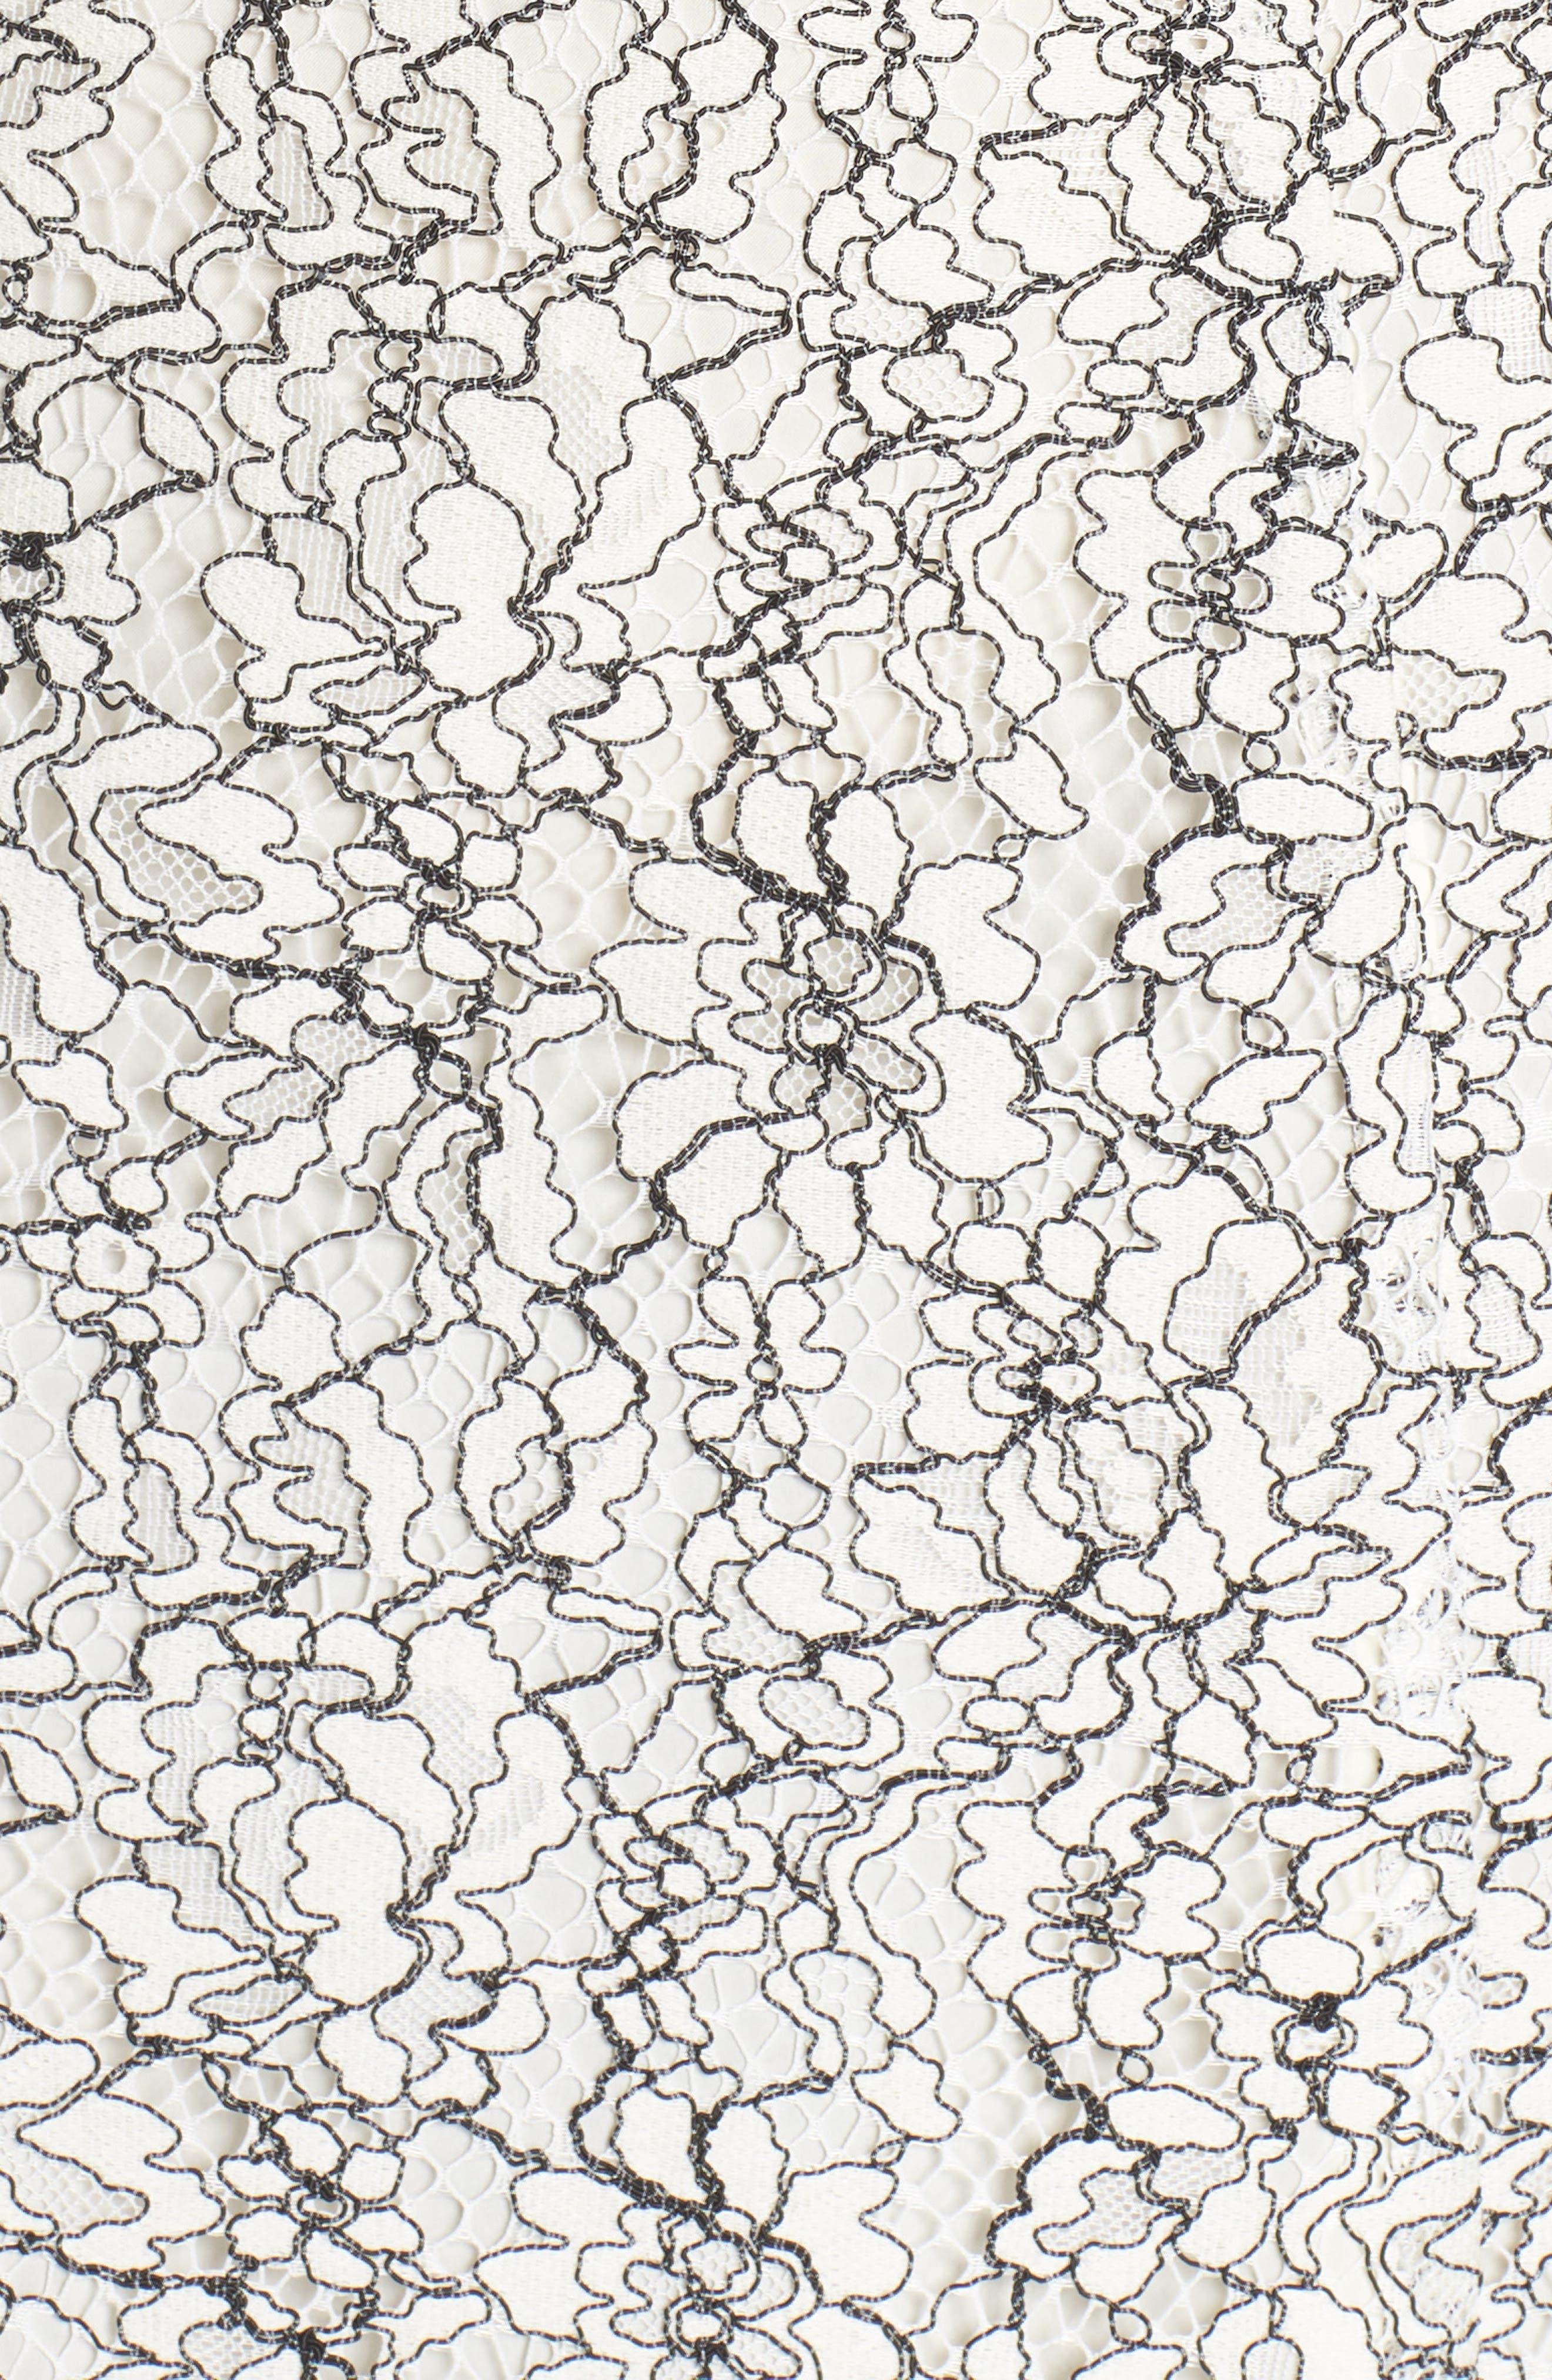 Two-Tone Lace A-Line Dress,                             Alternate thumbnail 5, color,                             Ivory/ Black